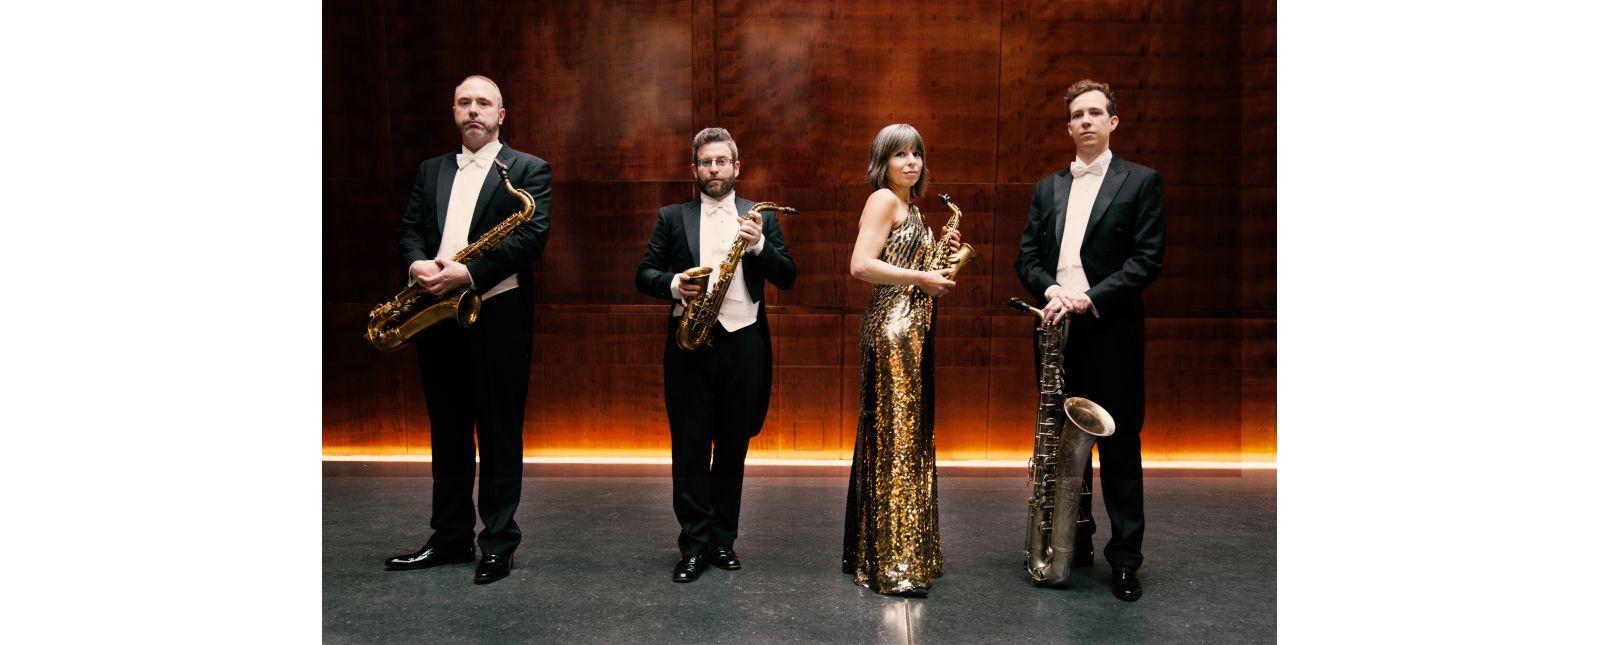 Raschèr Saxophone-Quartett //  Foto: Felix Broede